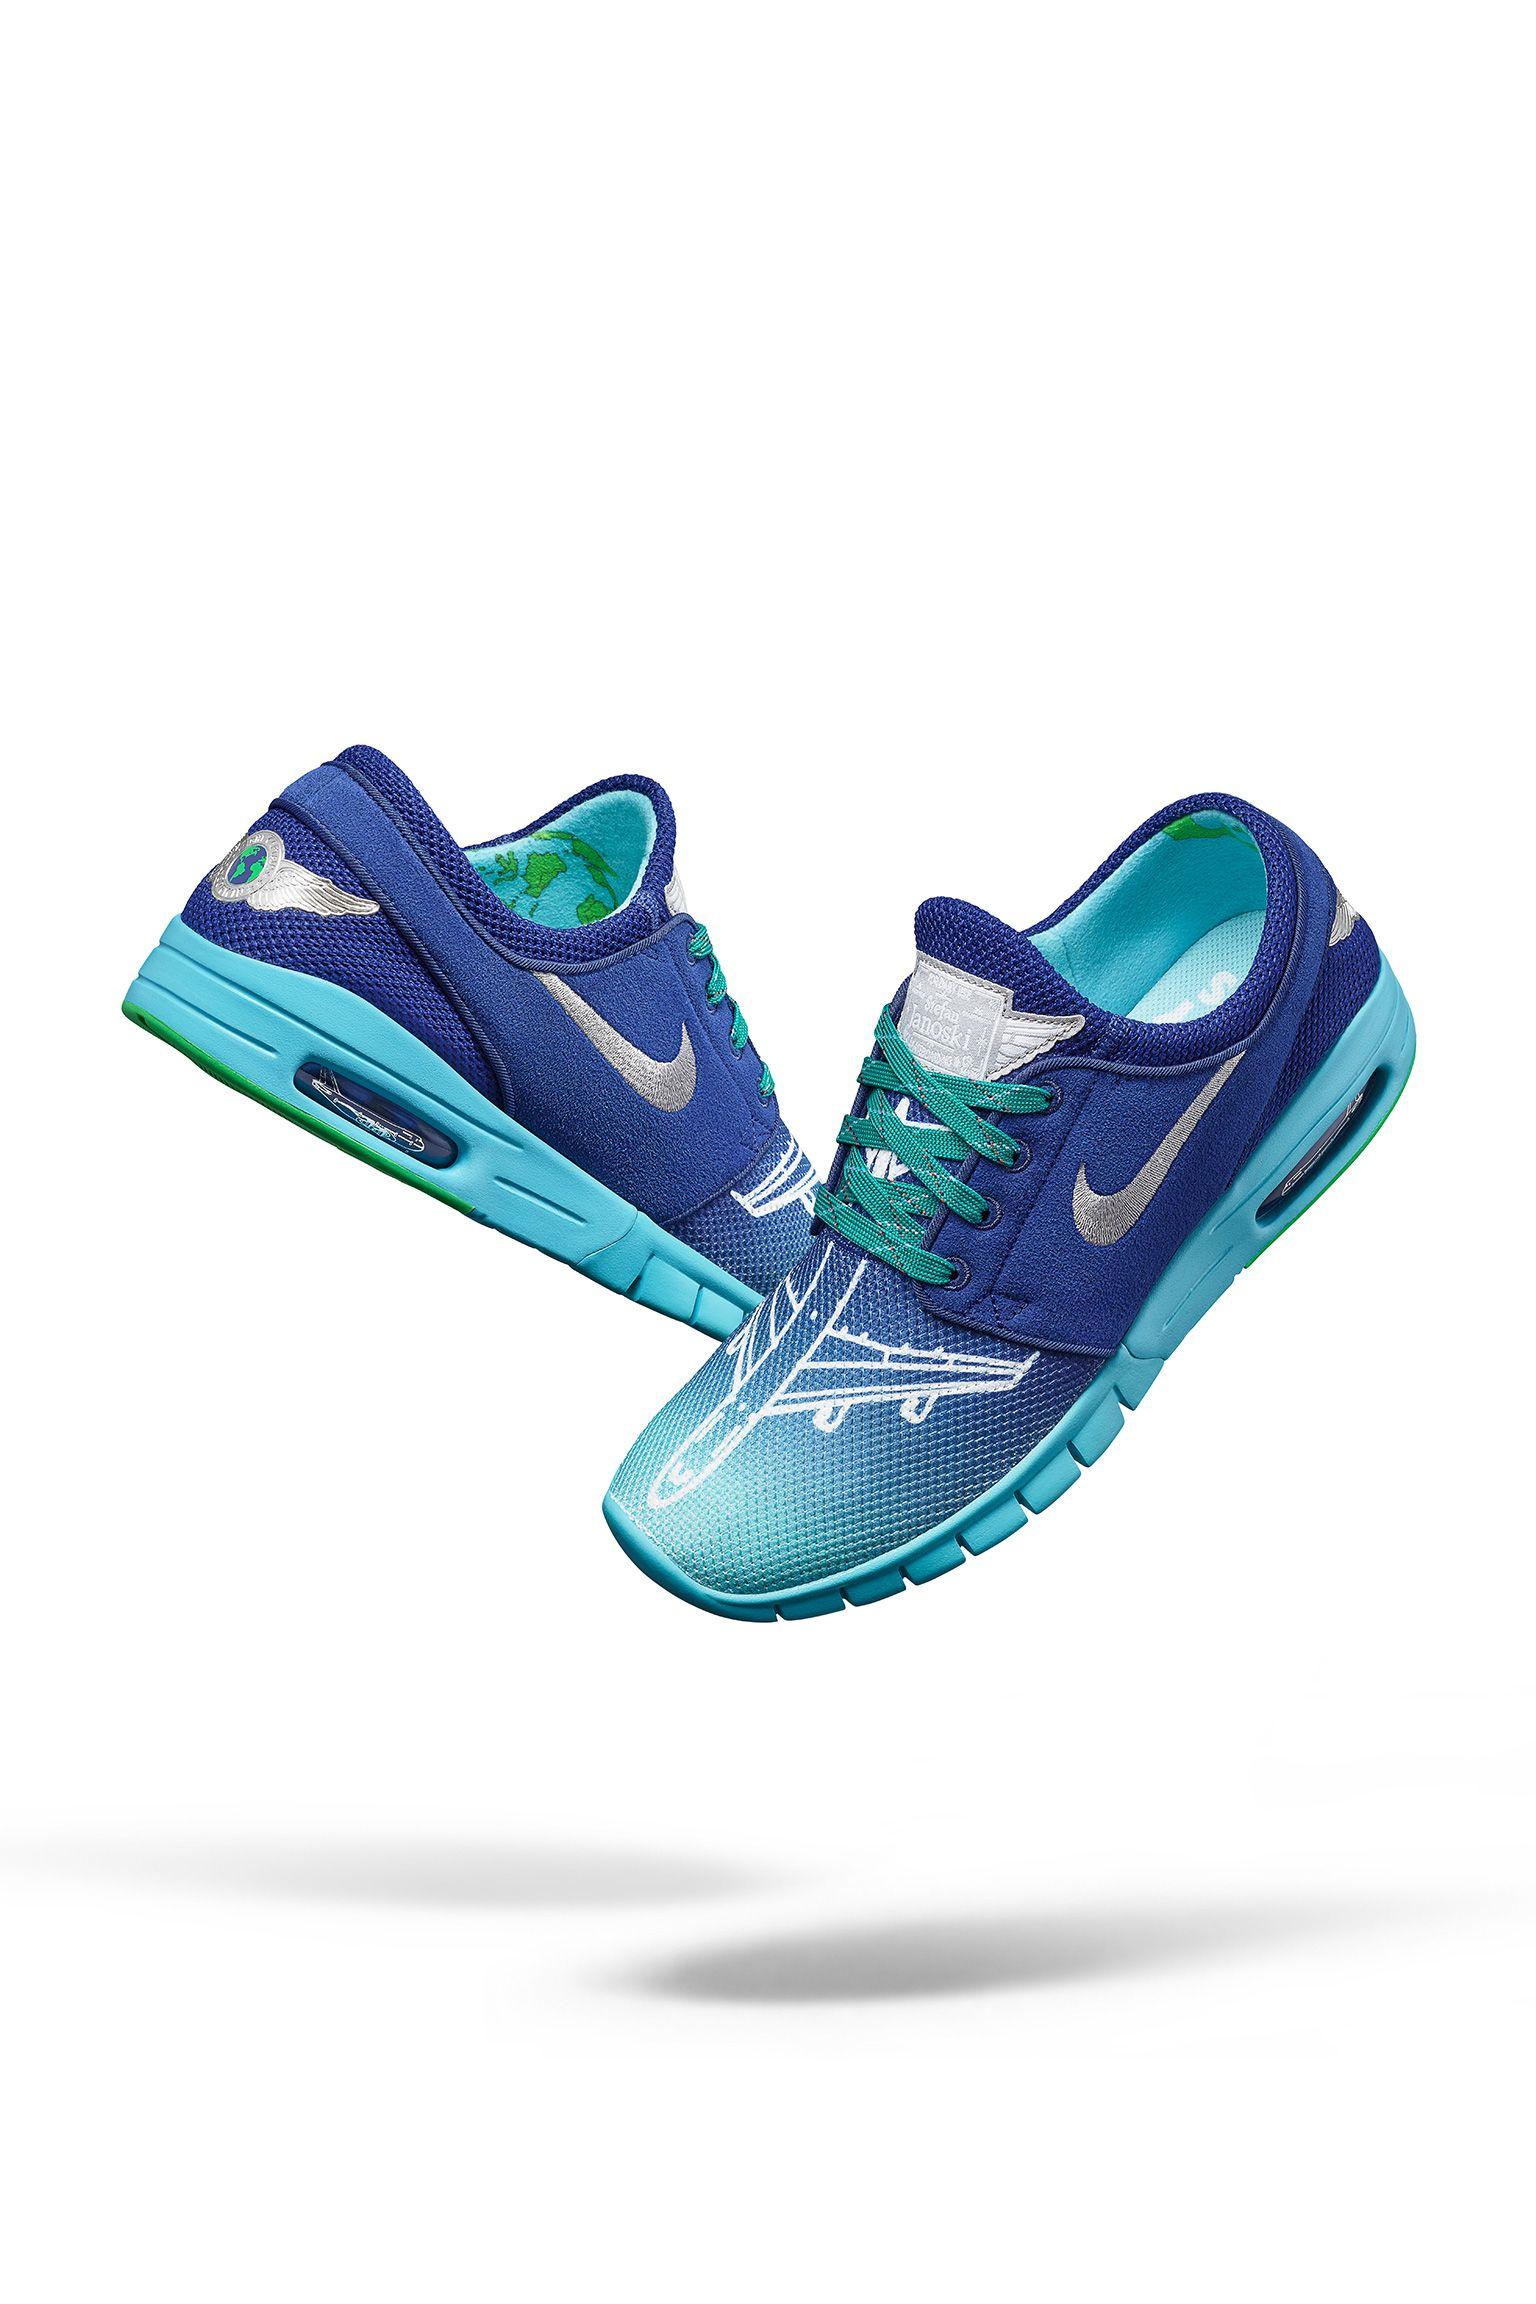 Corwin's Nike SB Stefan Janoski Max (Doernbecher)